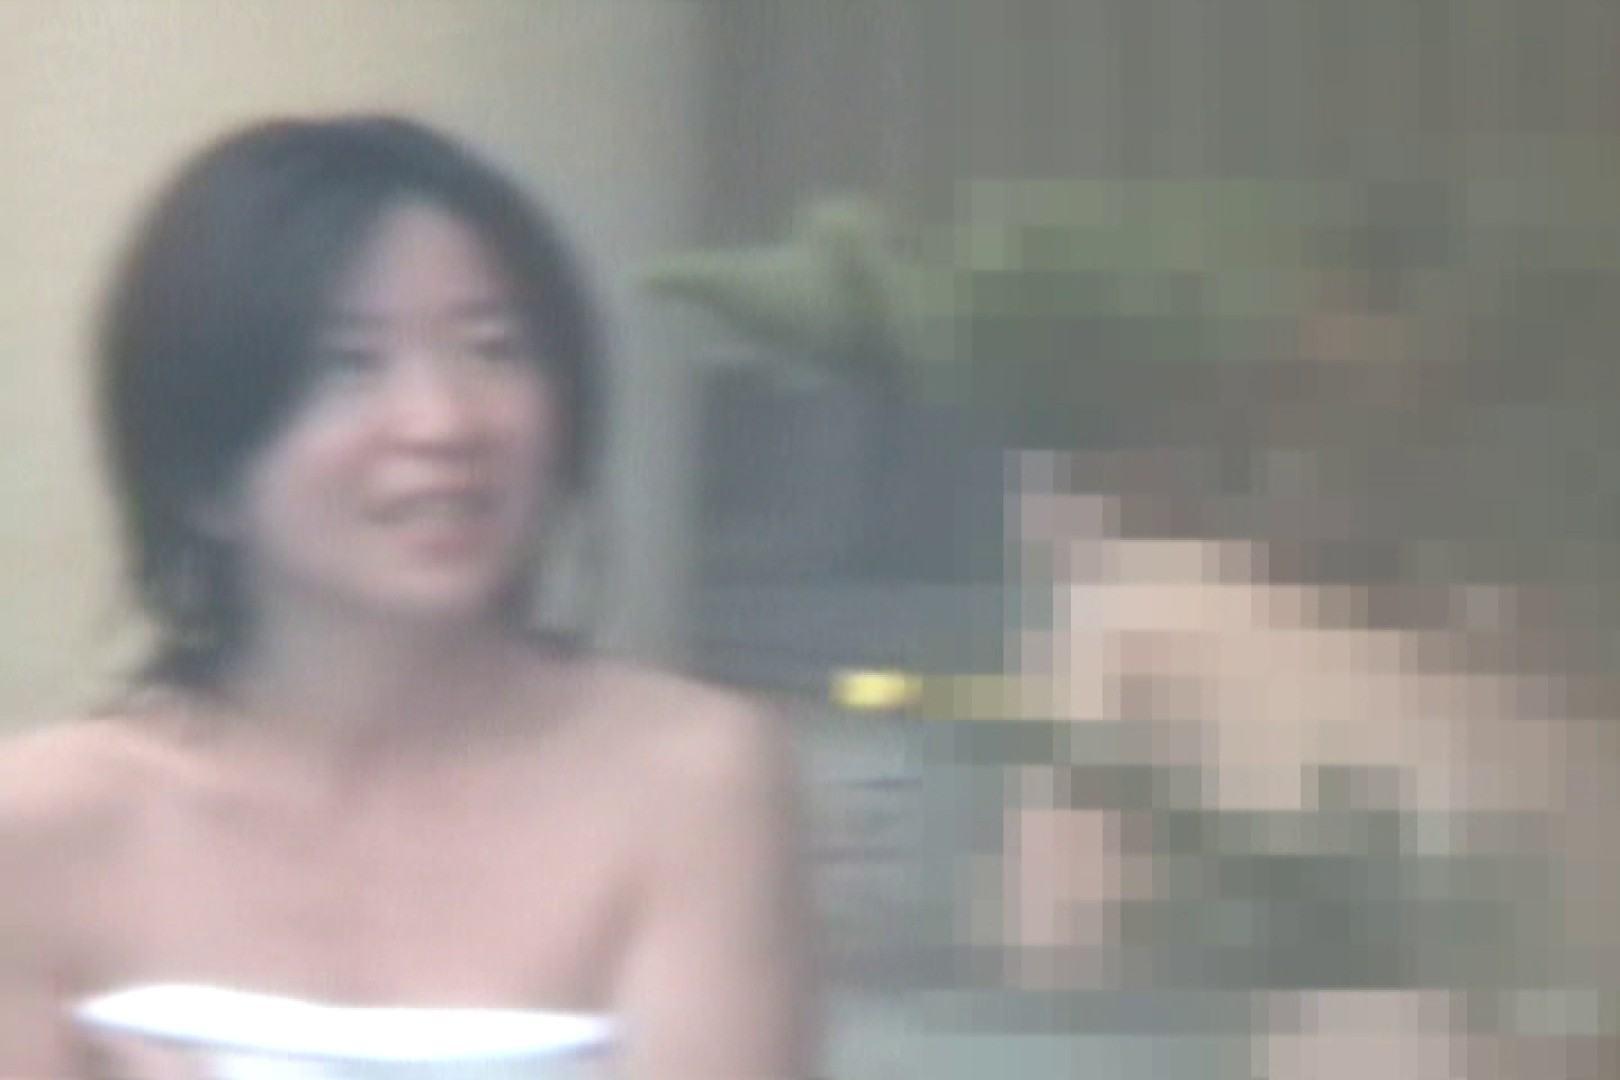 Aquaな露天風呂Vol.841 OLセックス 盗撮セックス無修正動画無料 56画像 8